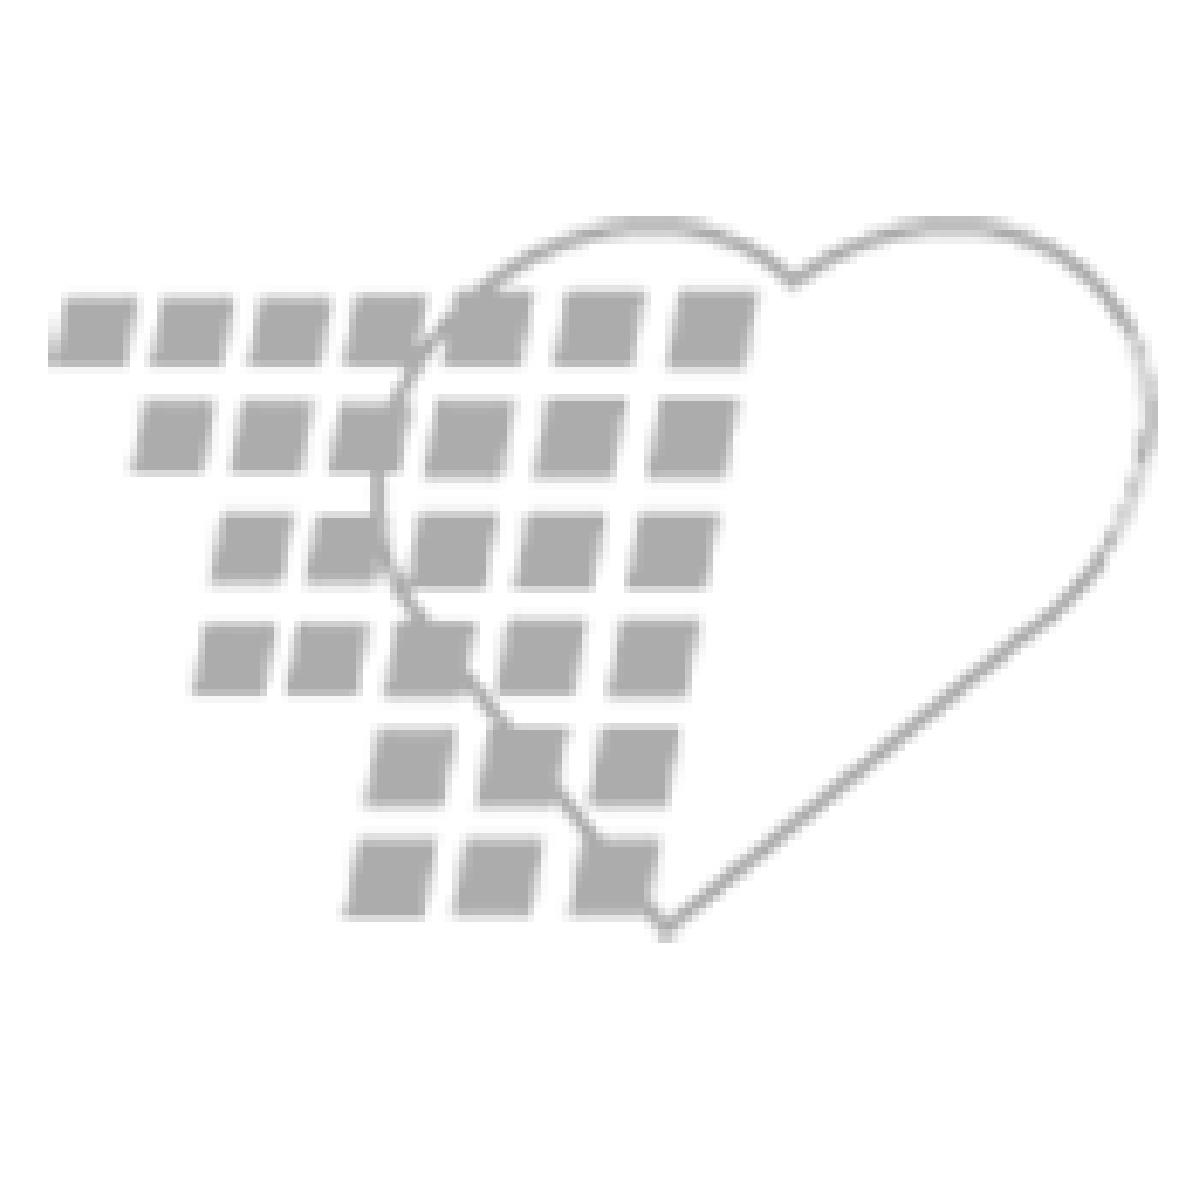 04-25-0233 - Clinton Folding Cart Frame